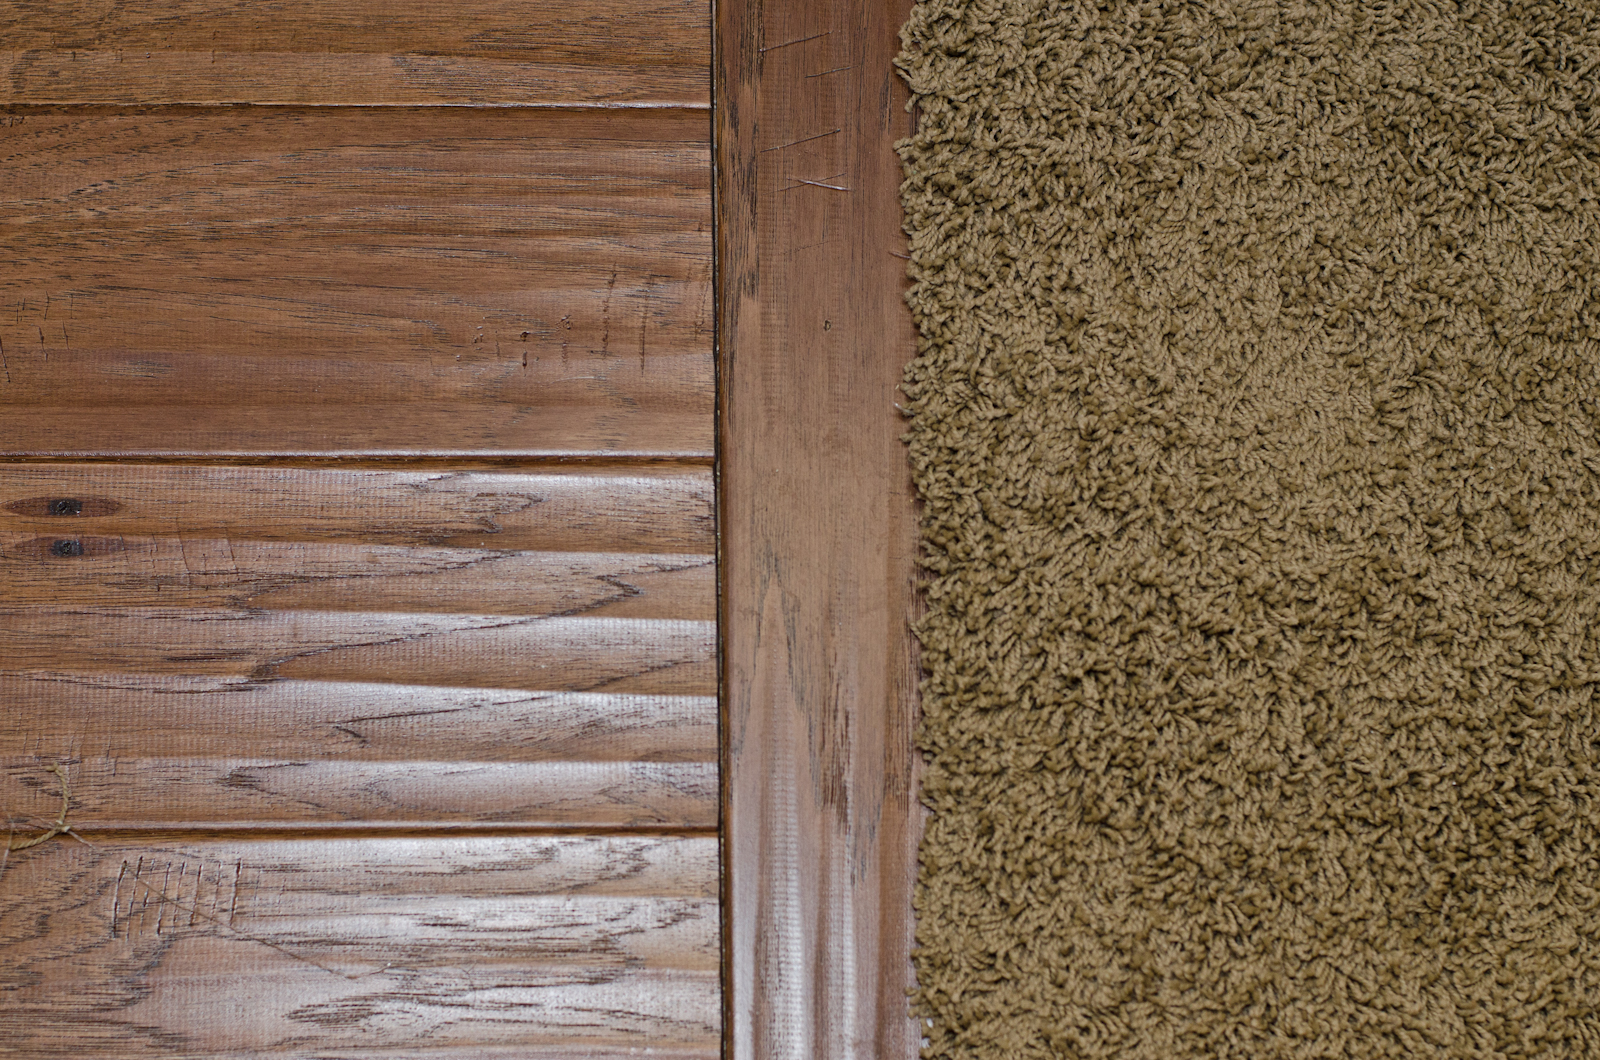 Wood Floor To Carpet Transition - Carpet Vidalondon